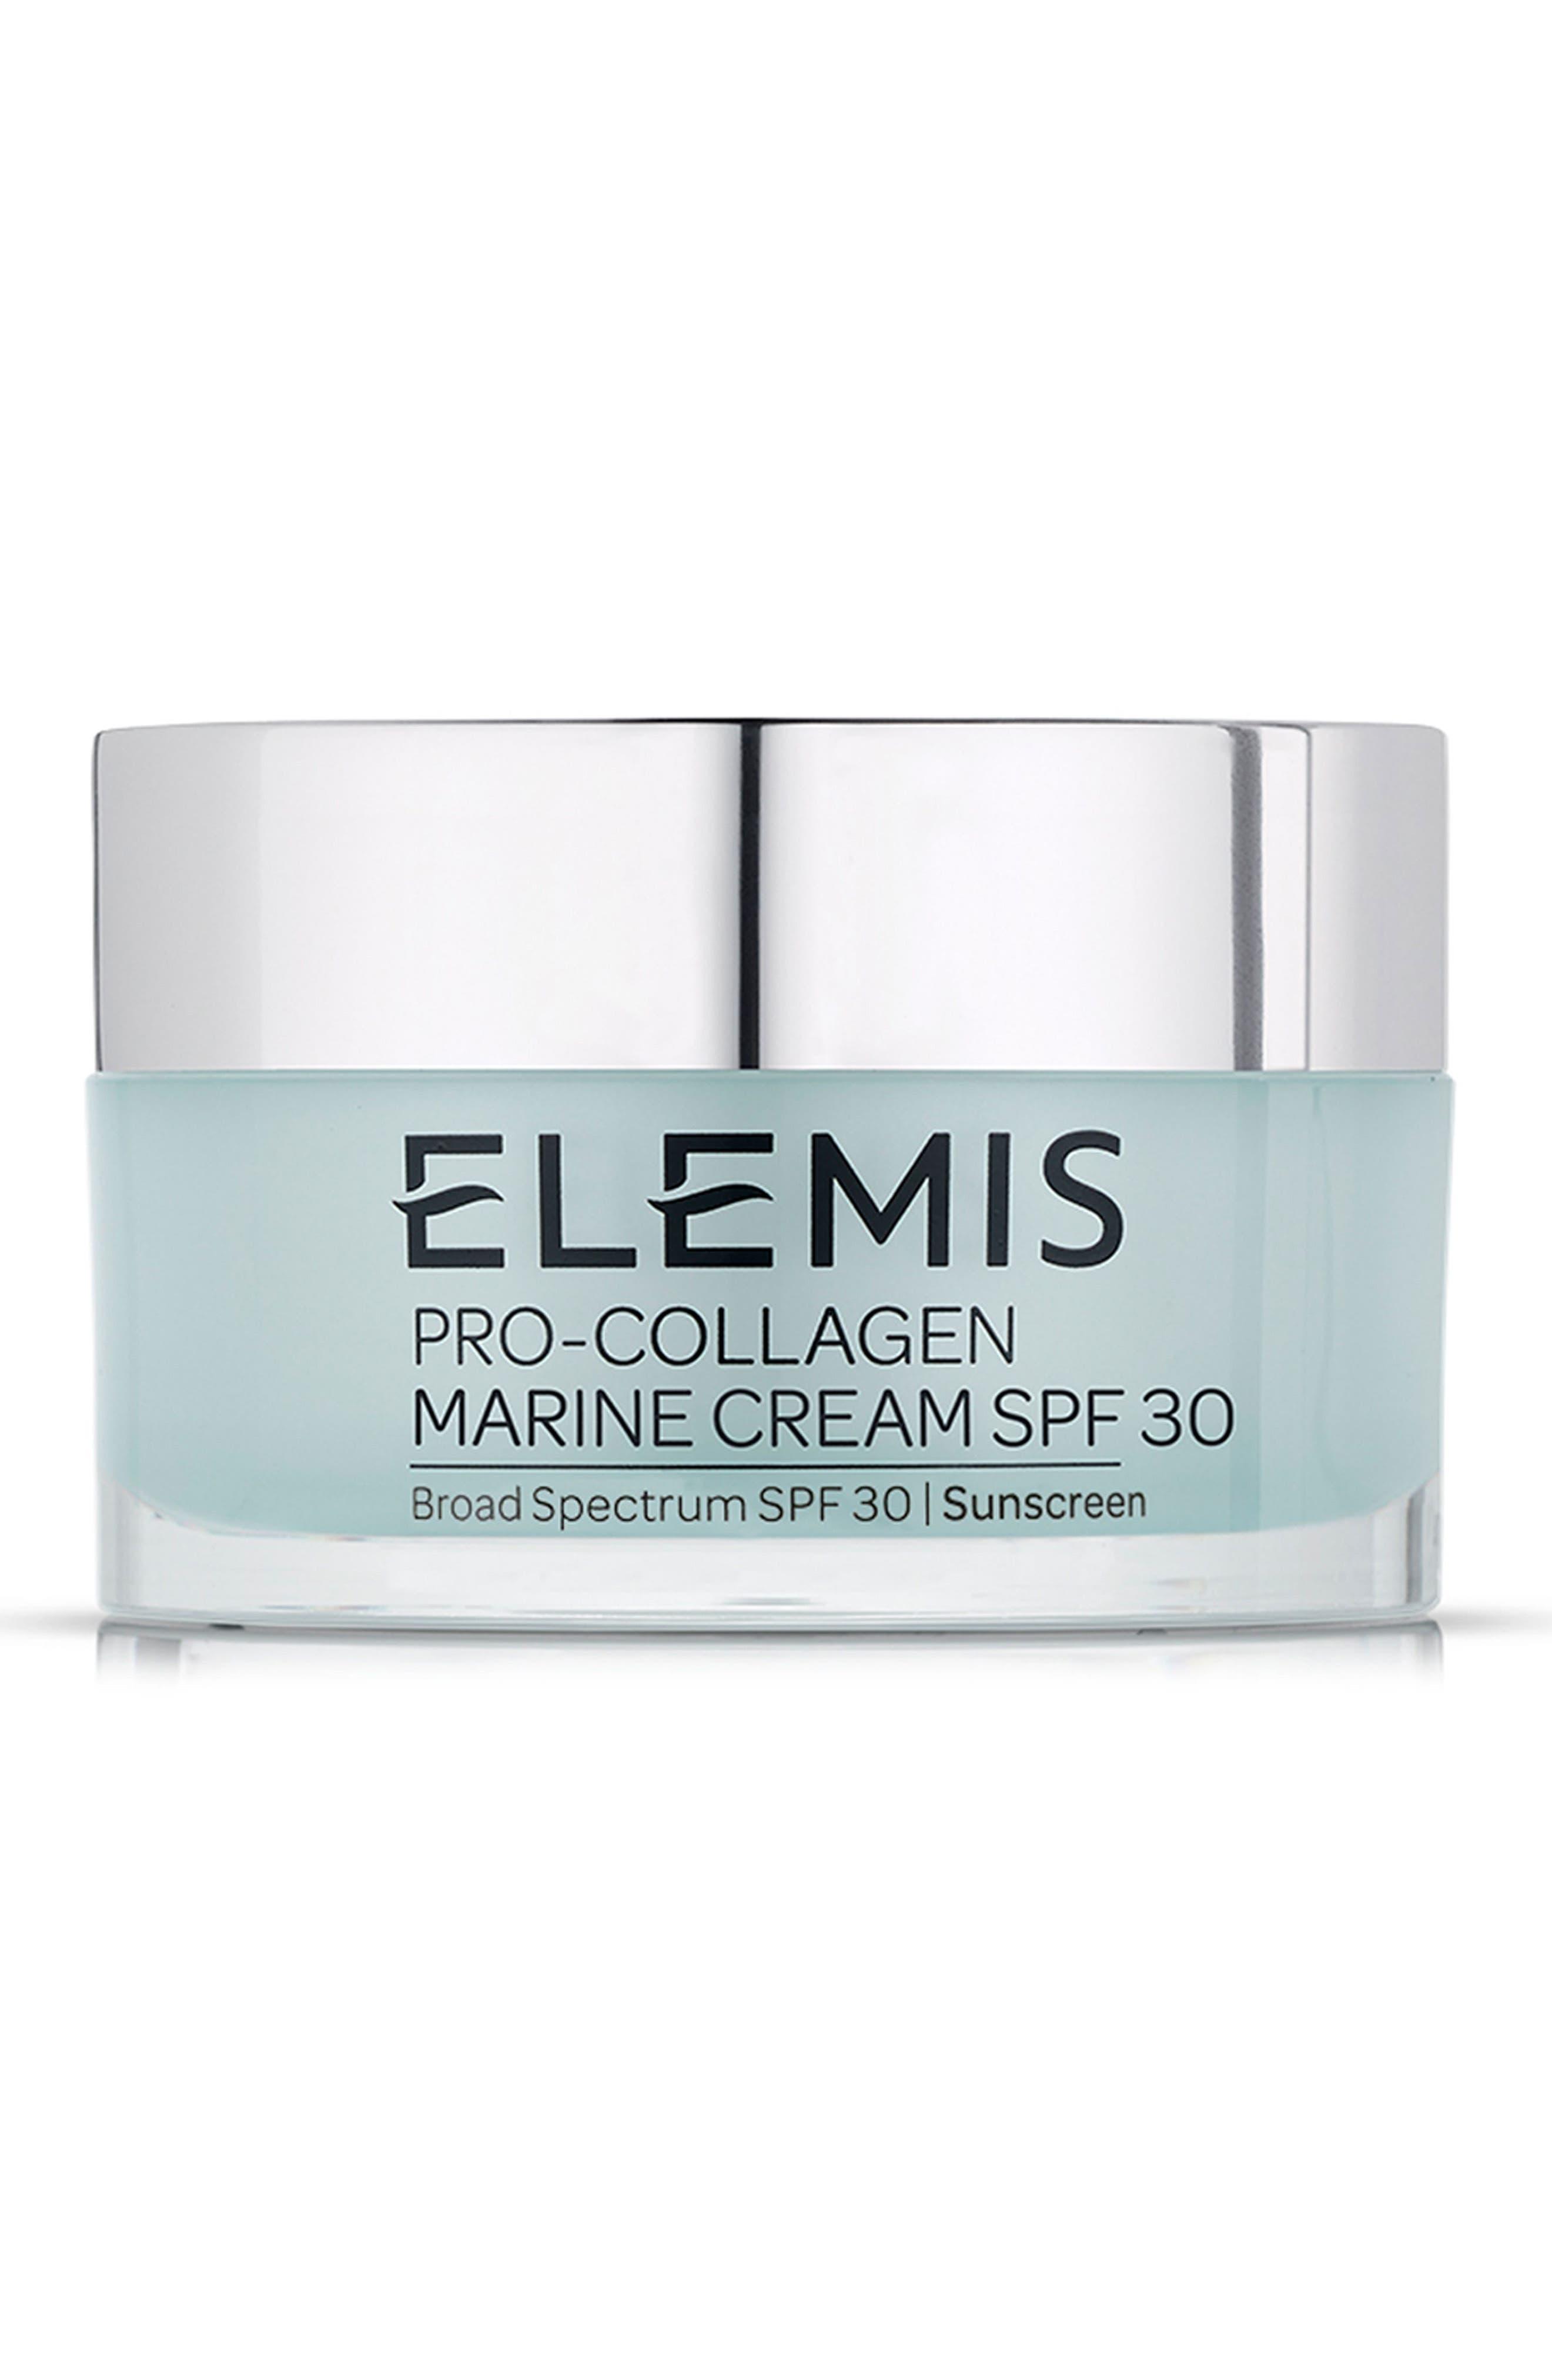 Pro-Collagen Marine Cream SPF 30,                         Main,                         color, NO COLOR